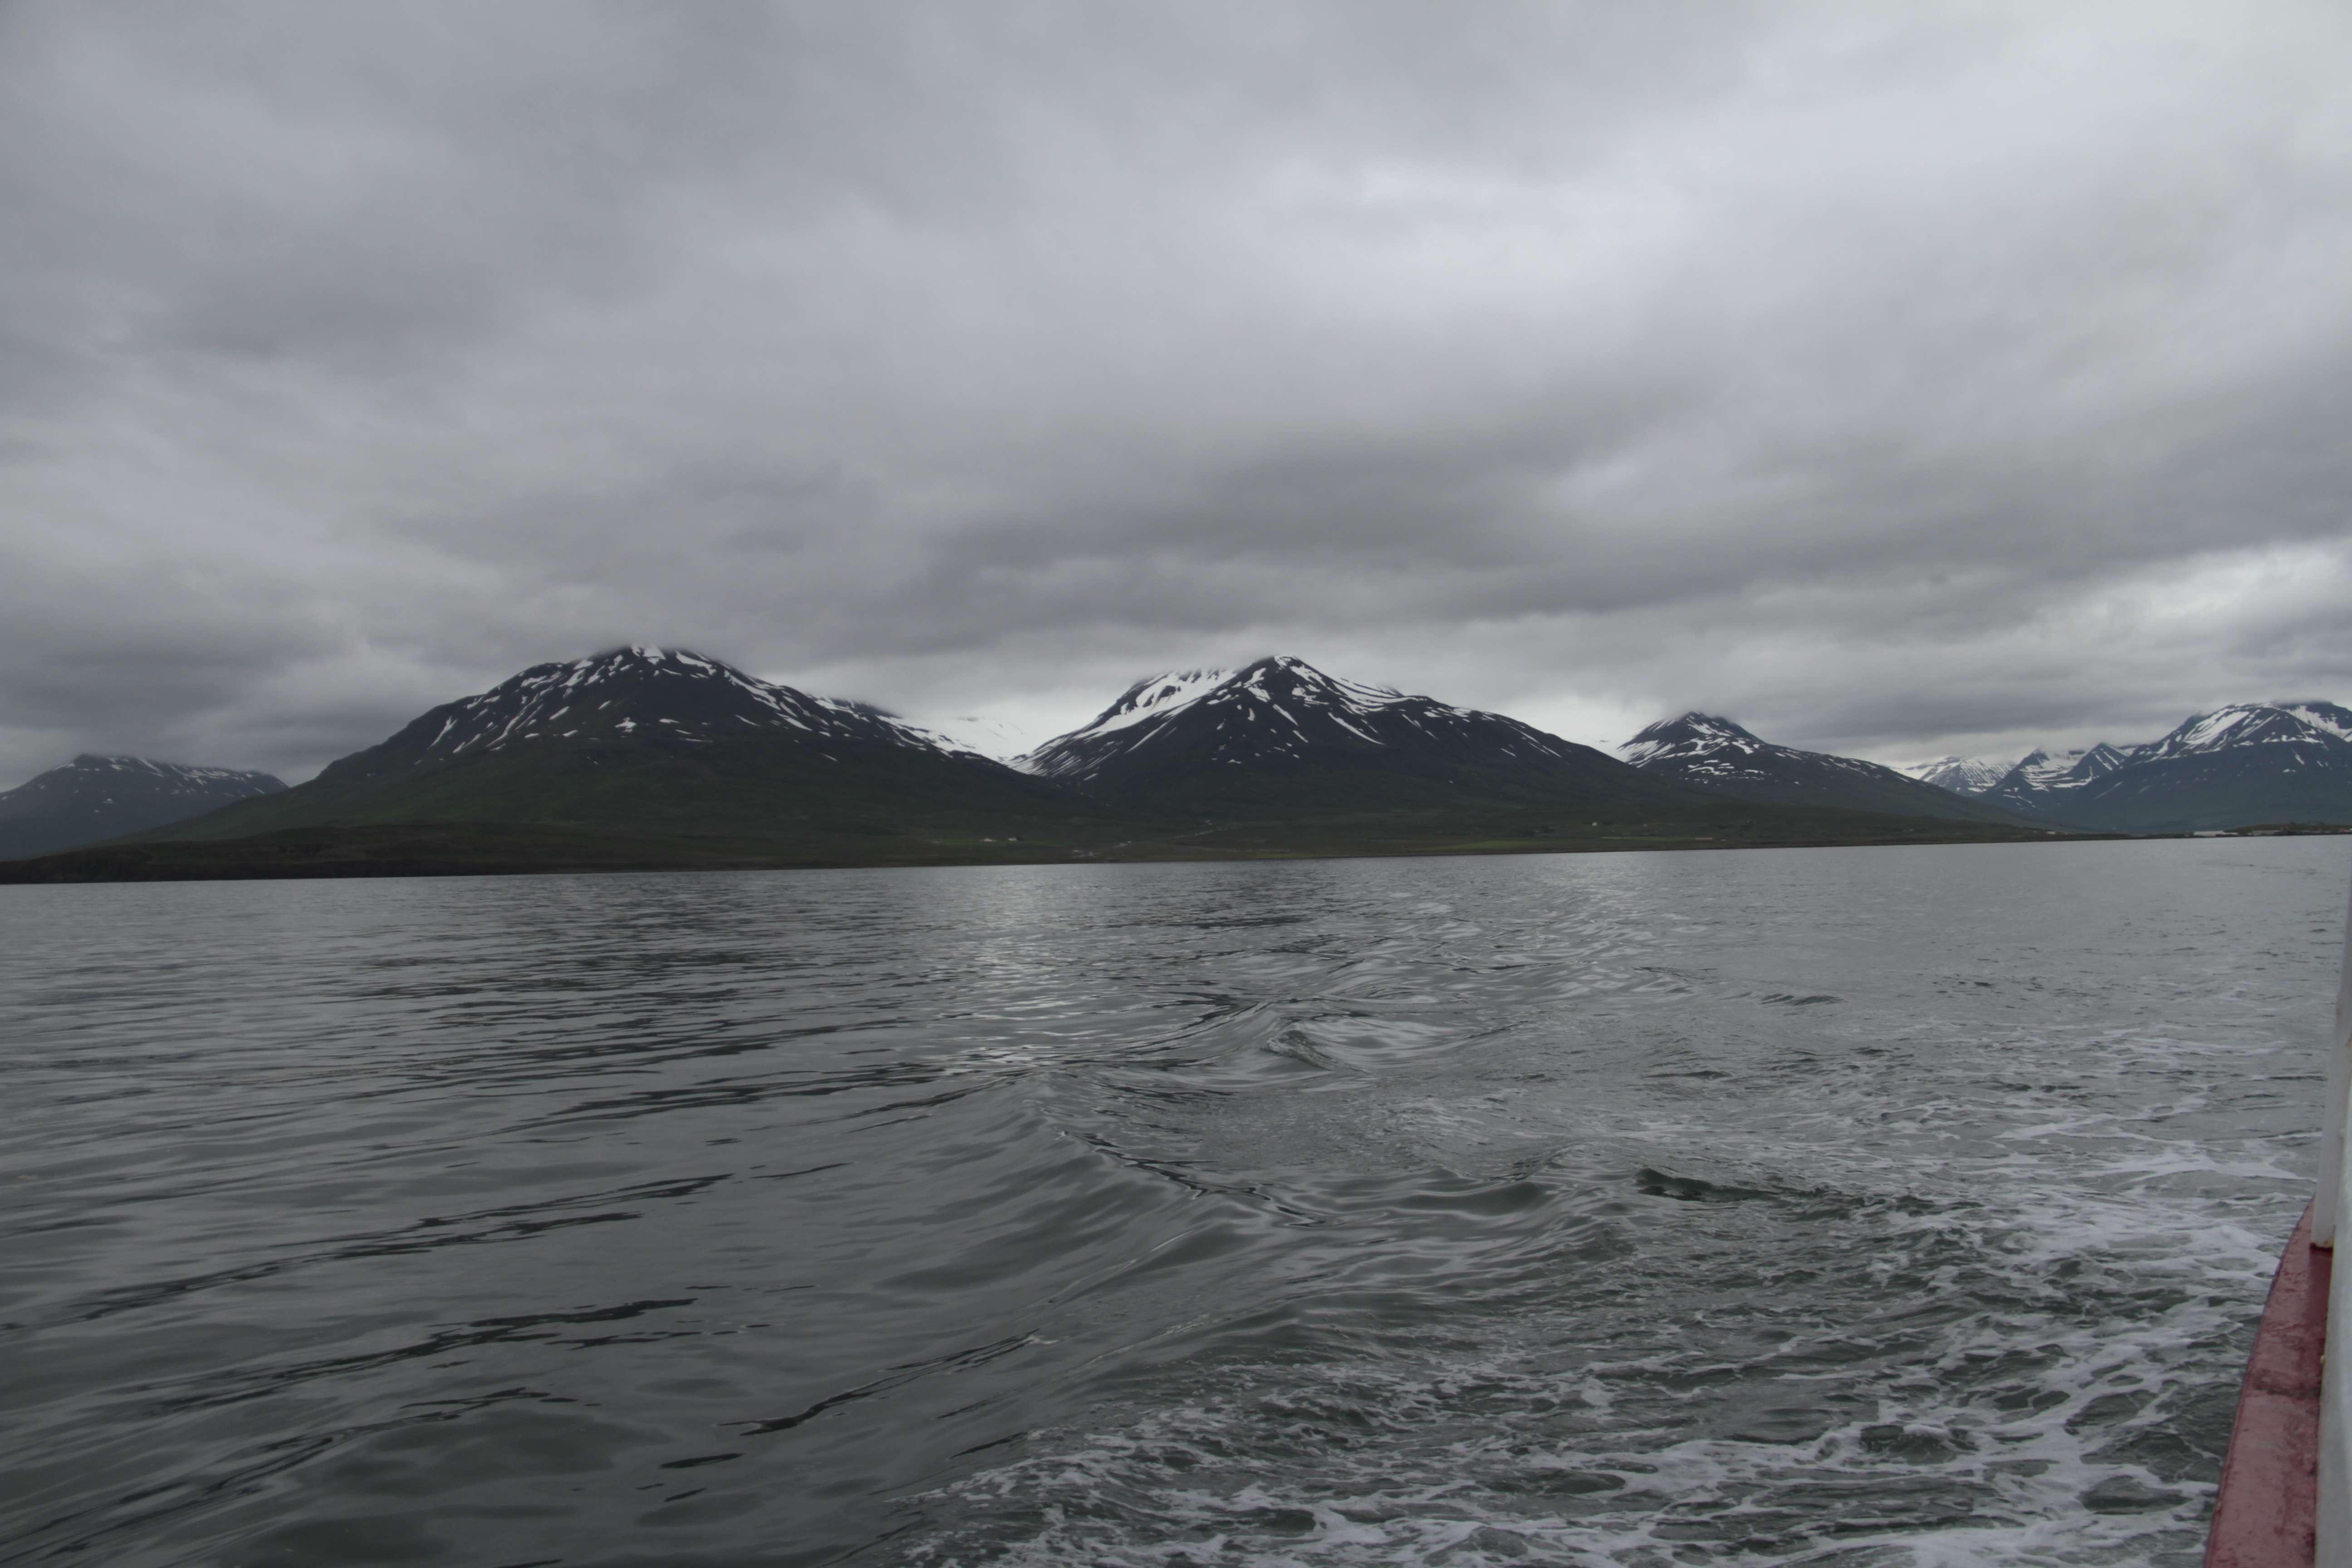 Islande_0123 Dalvik 11 juillet